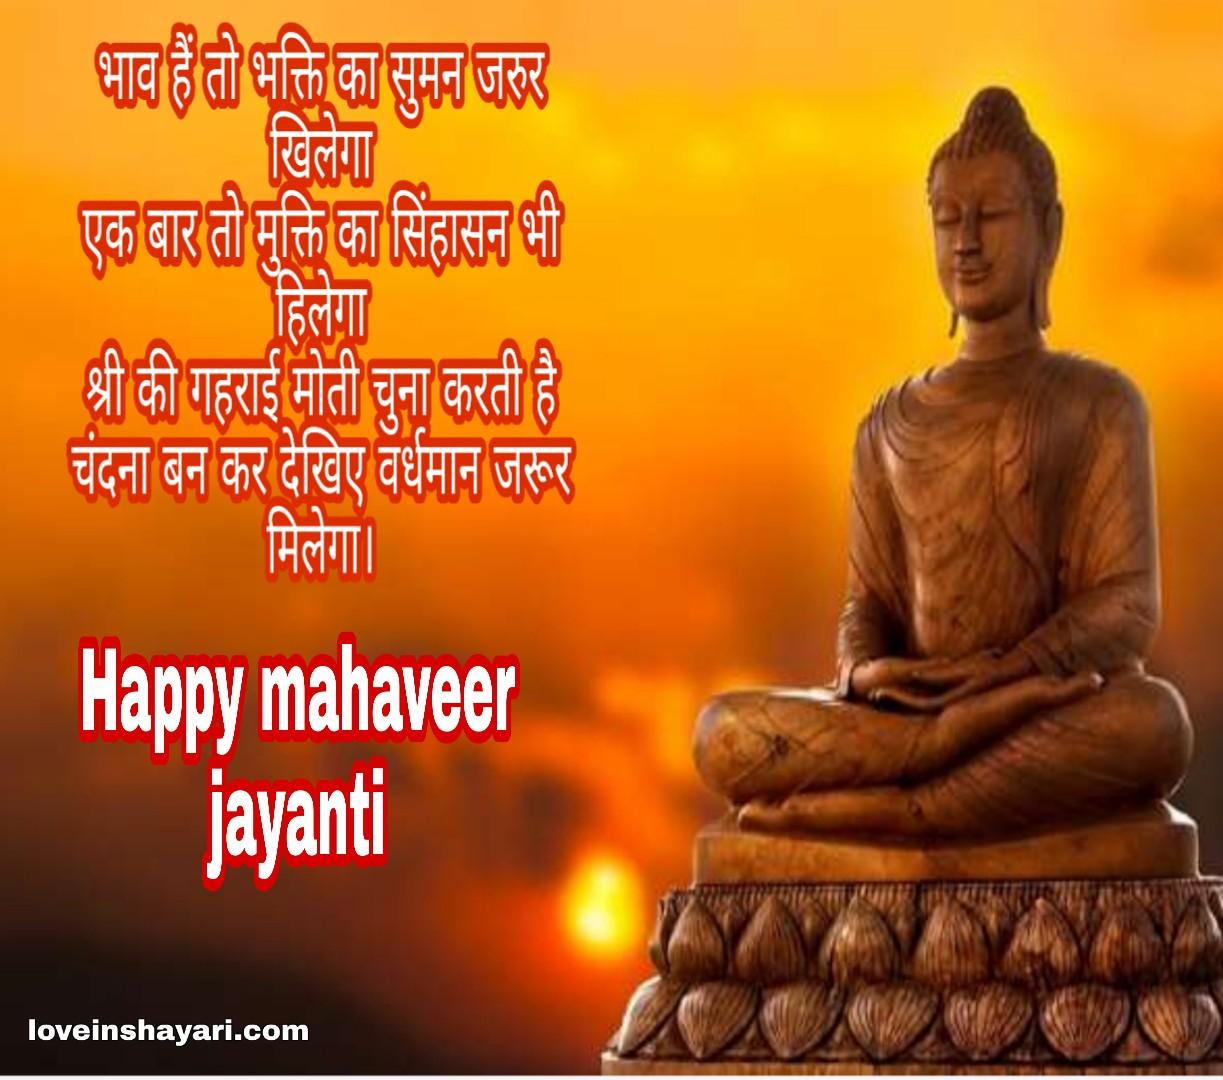 Mahaveer jayanti wishes shayari quotes message 2020